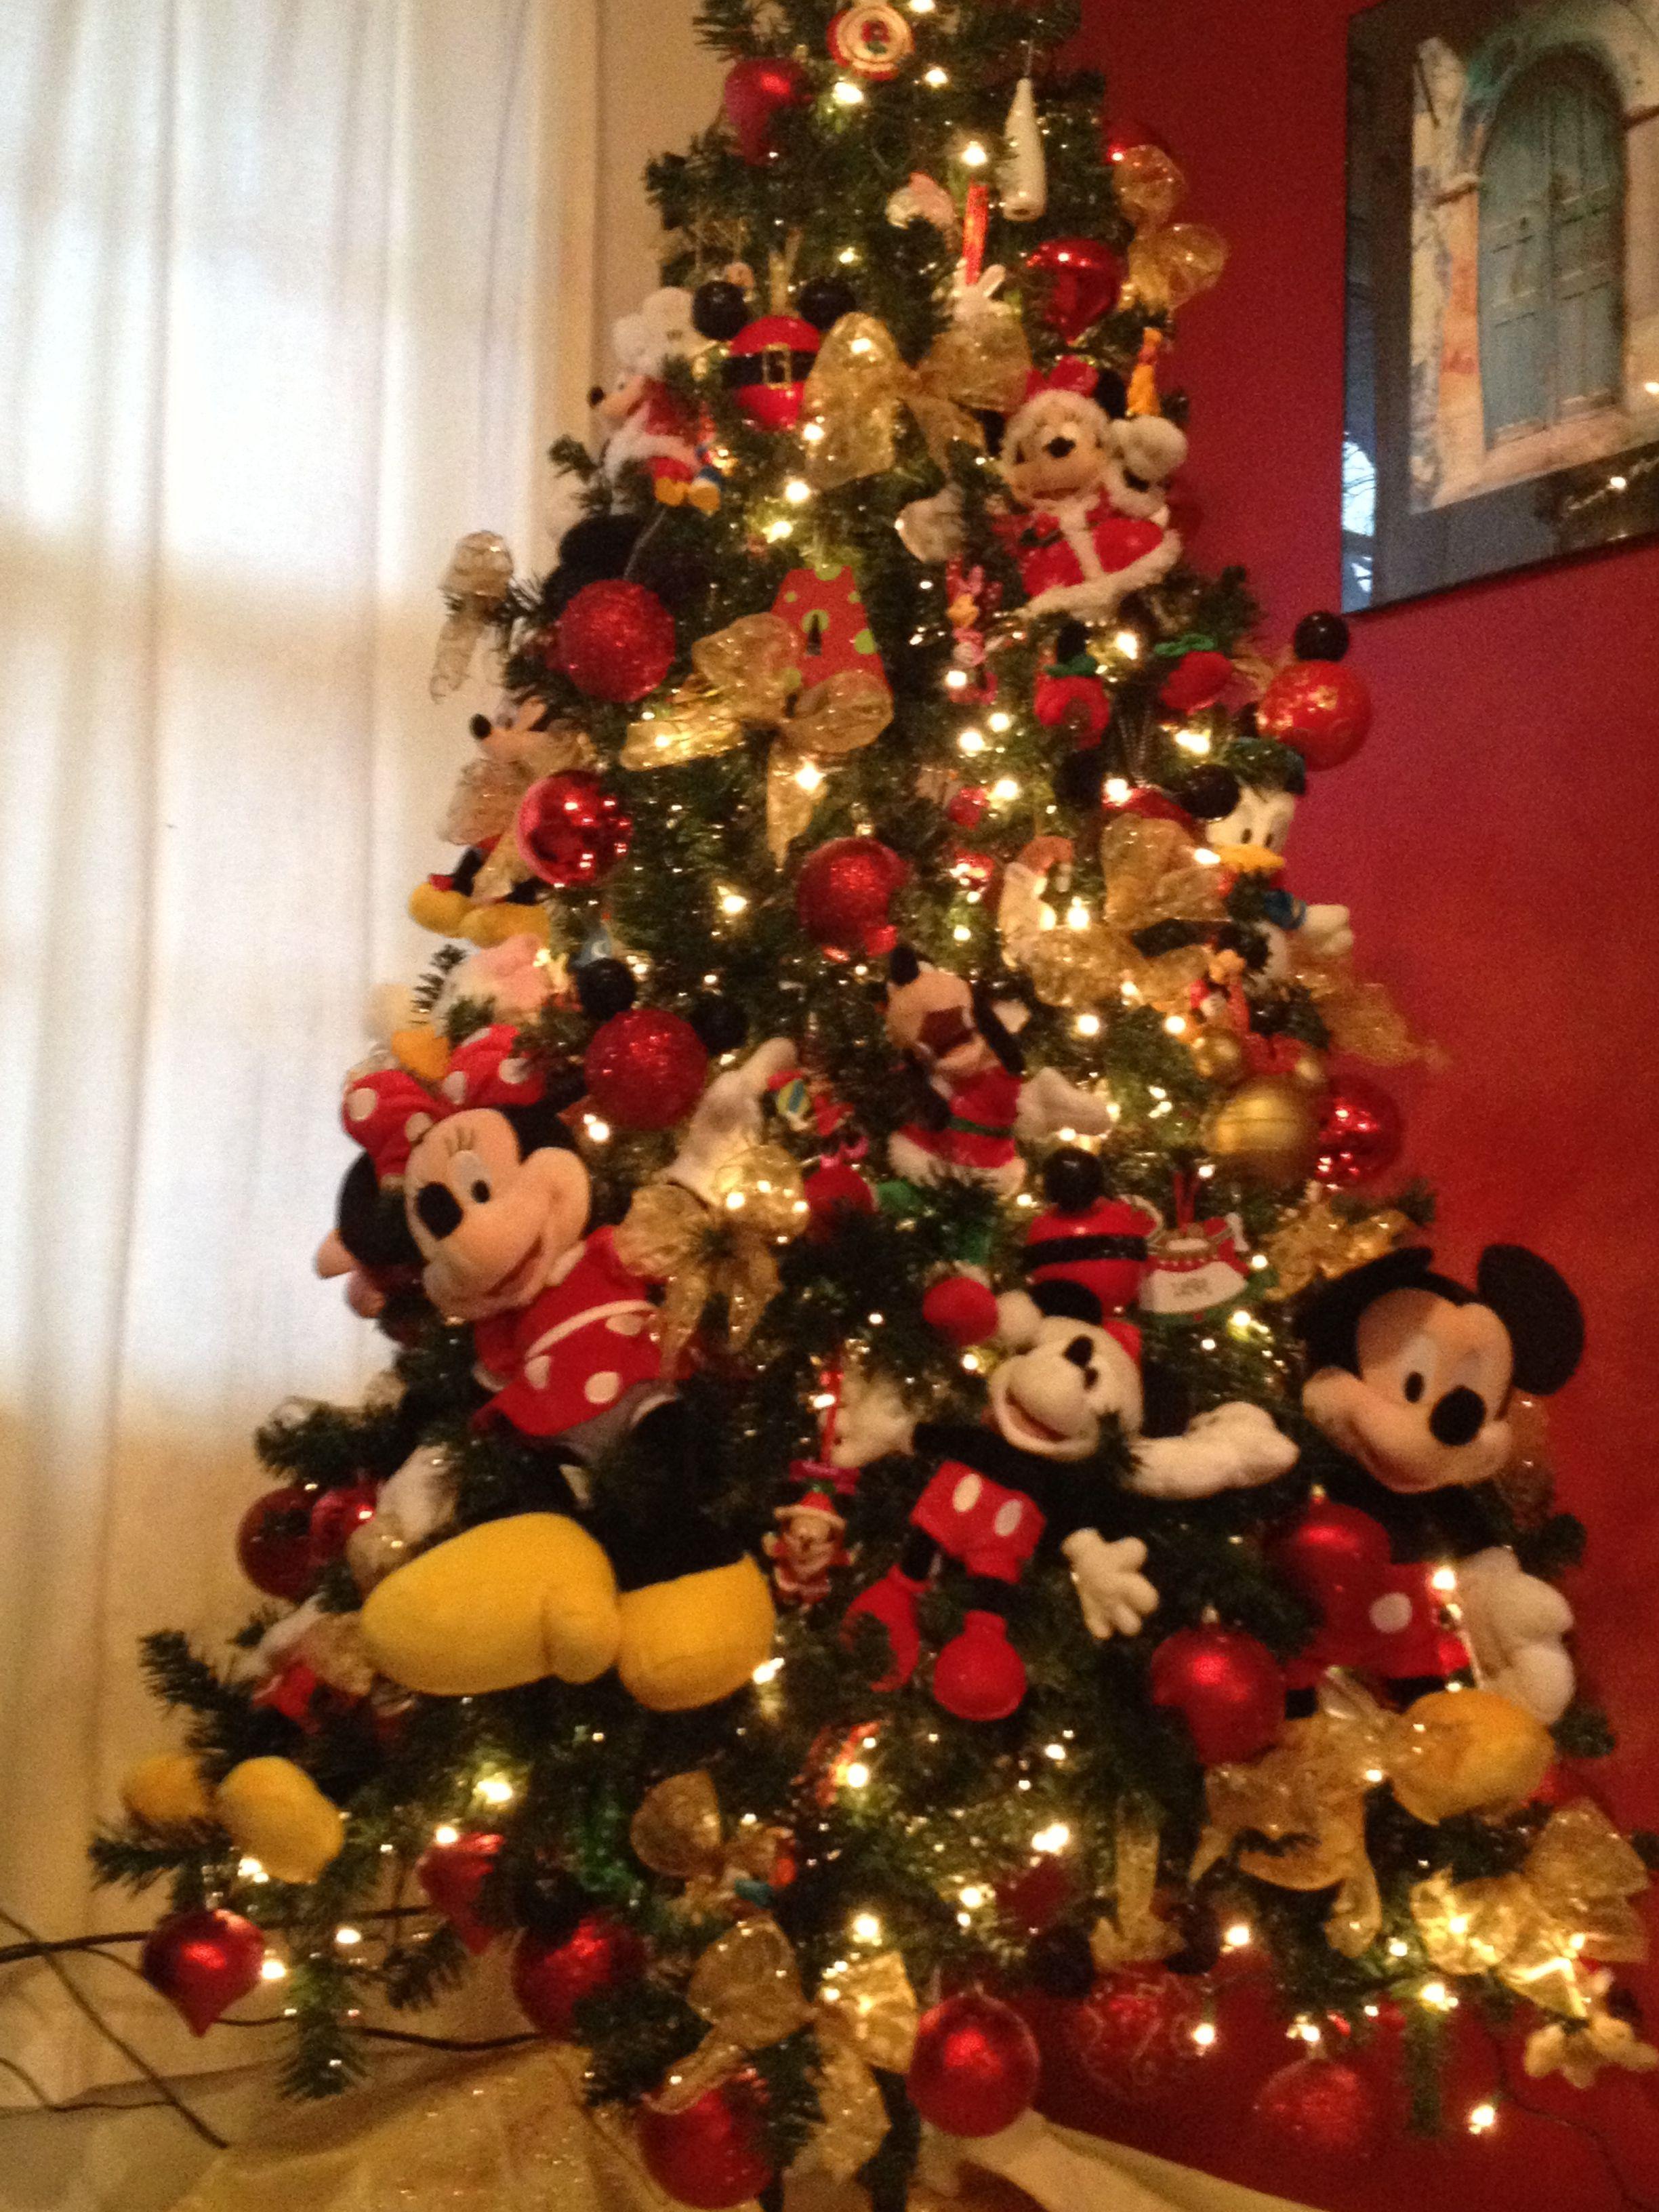 Mickey mouse and friends christmas tree everything - Arboles decorados de navidad ...